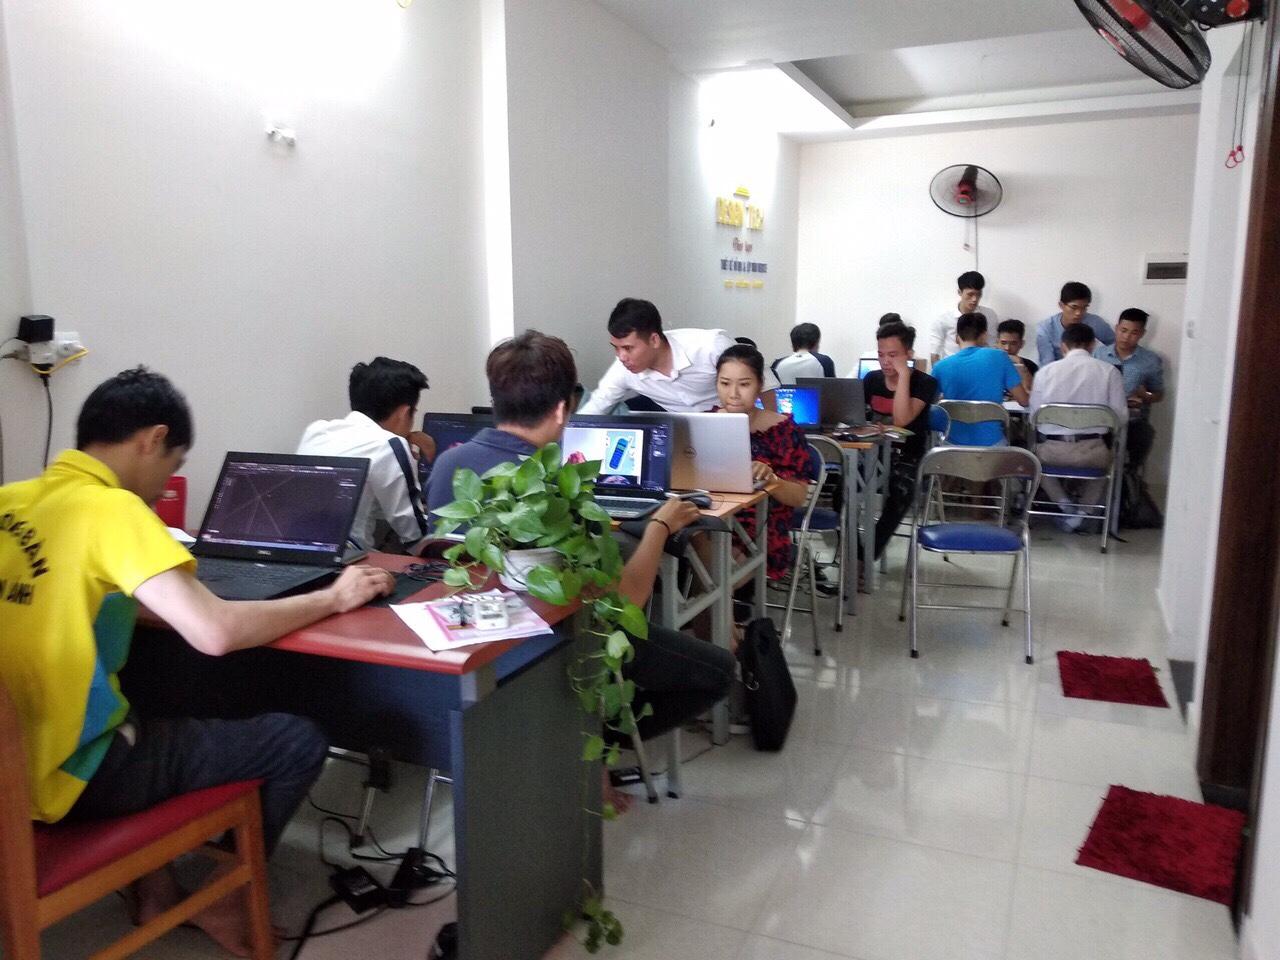 Khóa học indesign tại Hà Nội